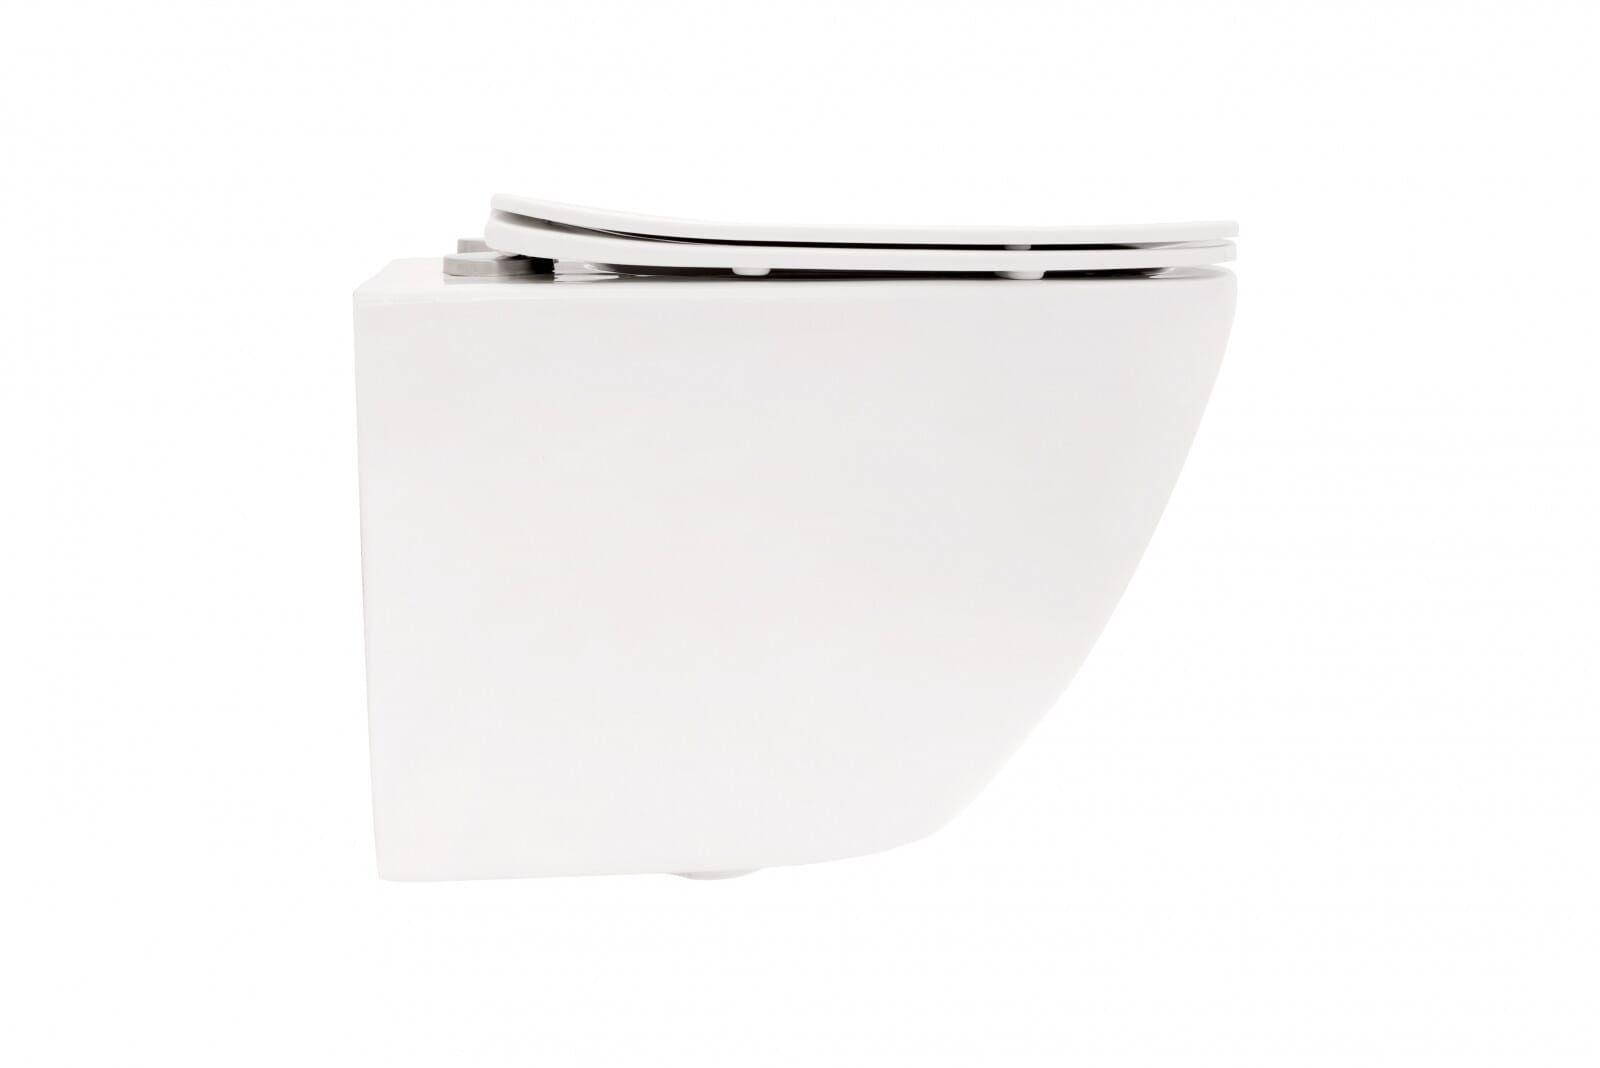 Misa WC podwieszana Carlo Mini Tornado Flat ZM Rea (REA-C2762)